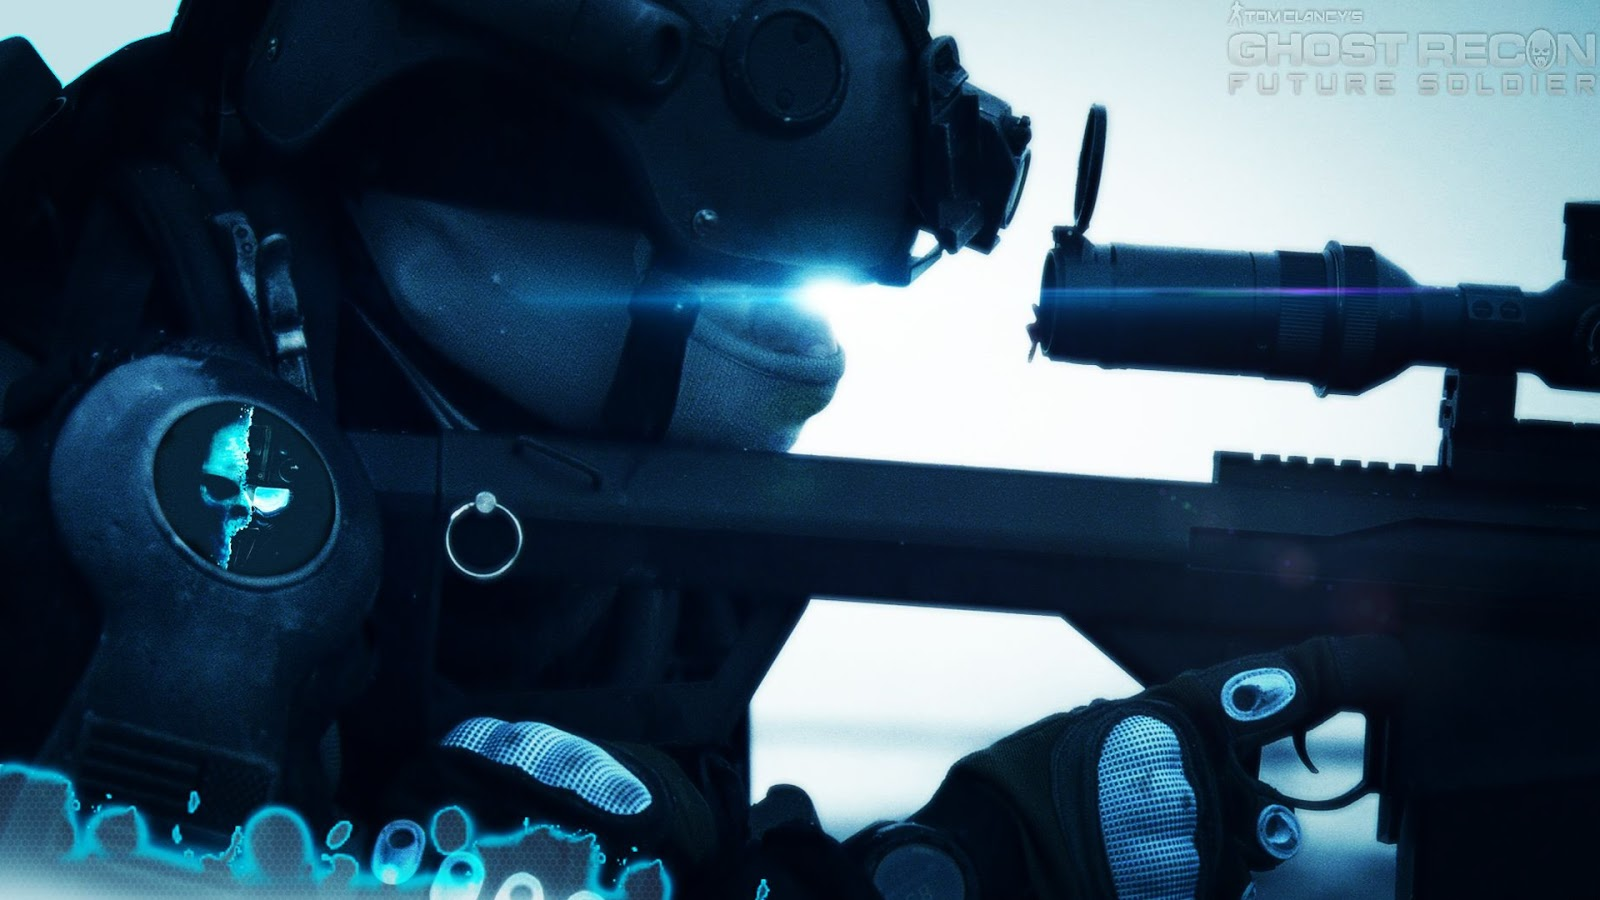 https://1.bp.blogspot.com/-bkT3m5K245w/UKZ2f527ssI/AAAAAAAAGHY/Wa_xXvl2JT4/s1600/Ghost-Recon-Future-Soldier-HD-Sniper-Wallpaper_Vvallpaper.Net.jpg